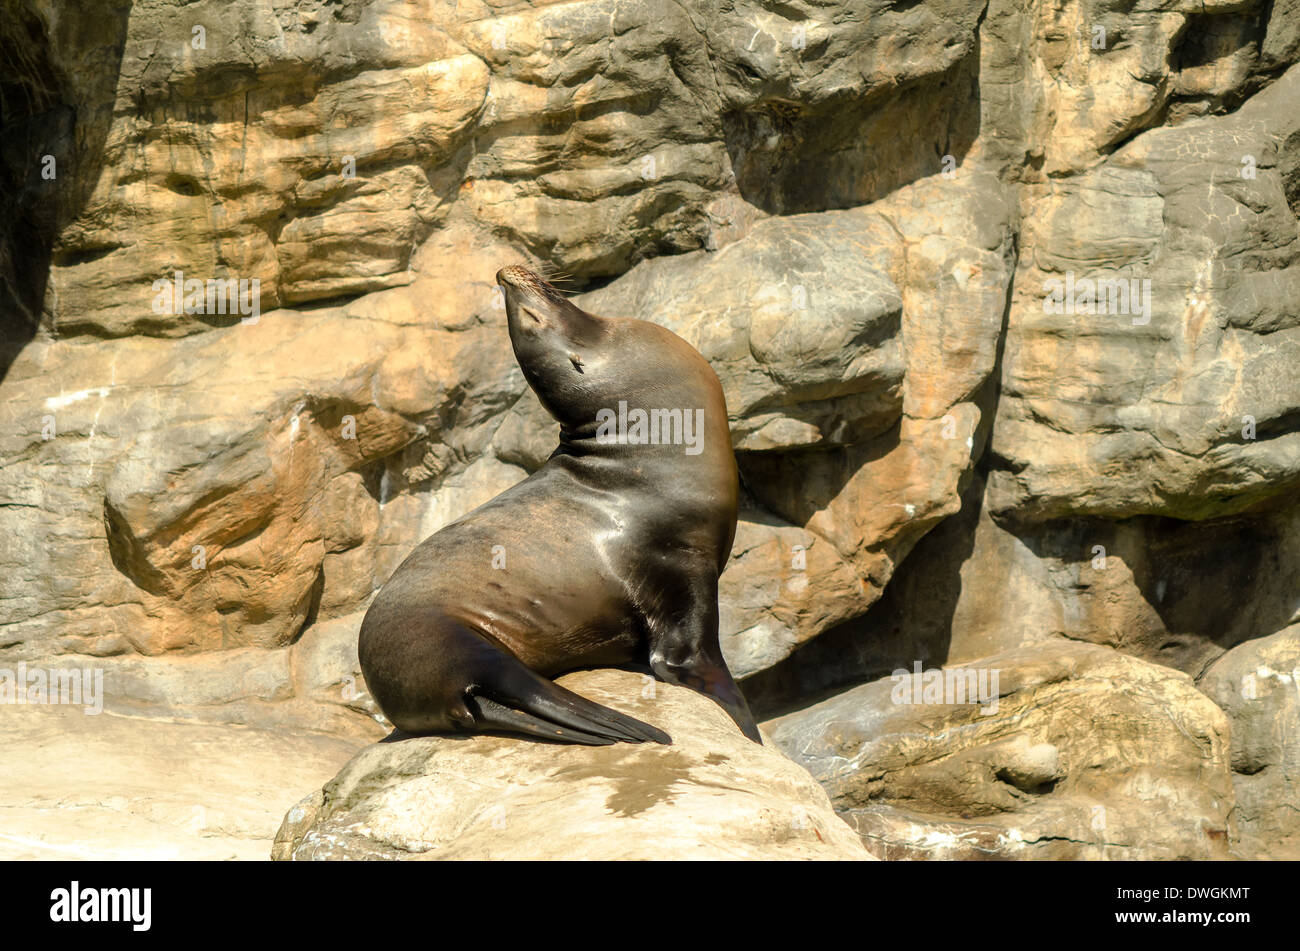 A sea lion sitting up enjoying the sun - Stock Image